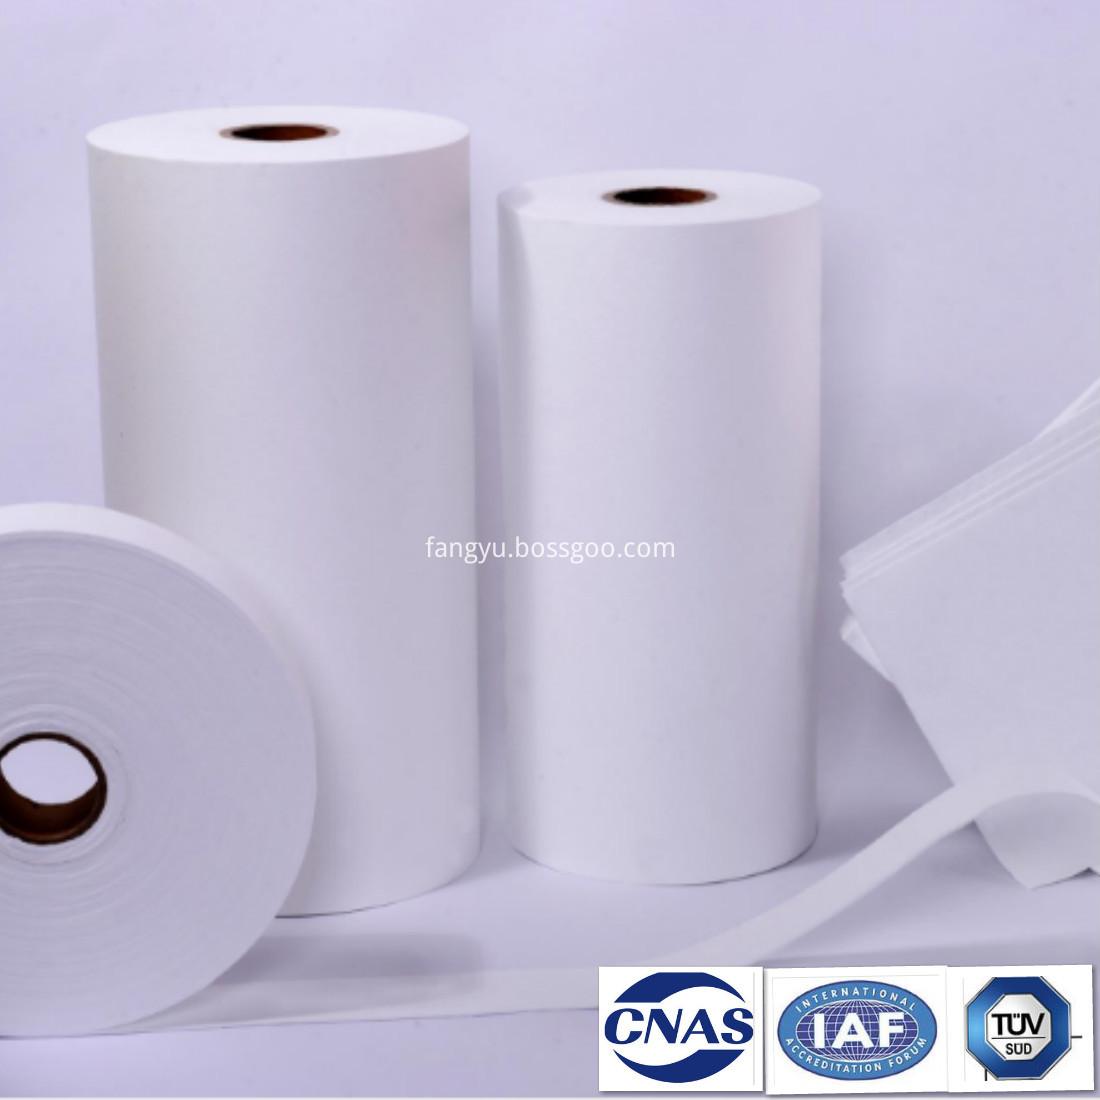 H13 fiterglass filter Paper